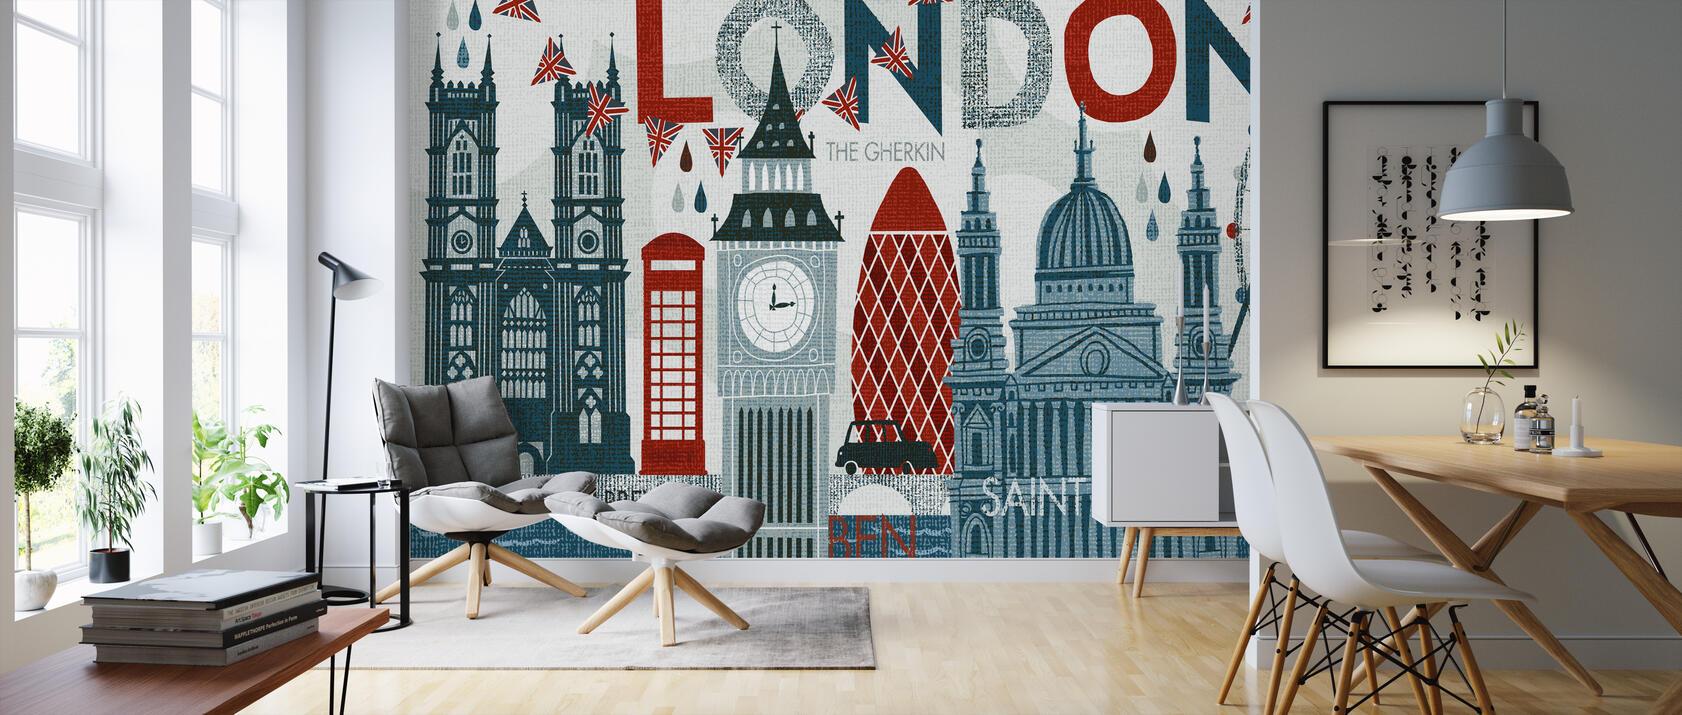 hello london trendige fototapete photowall. Black Bedroom Furniture Sets. Home Design Ideas